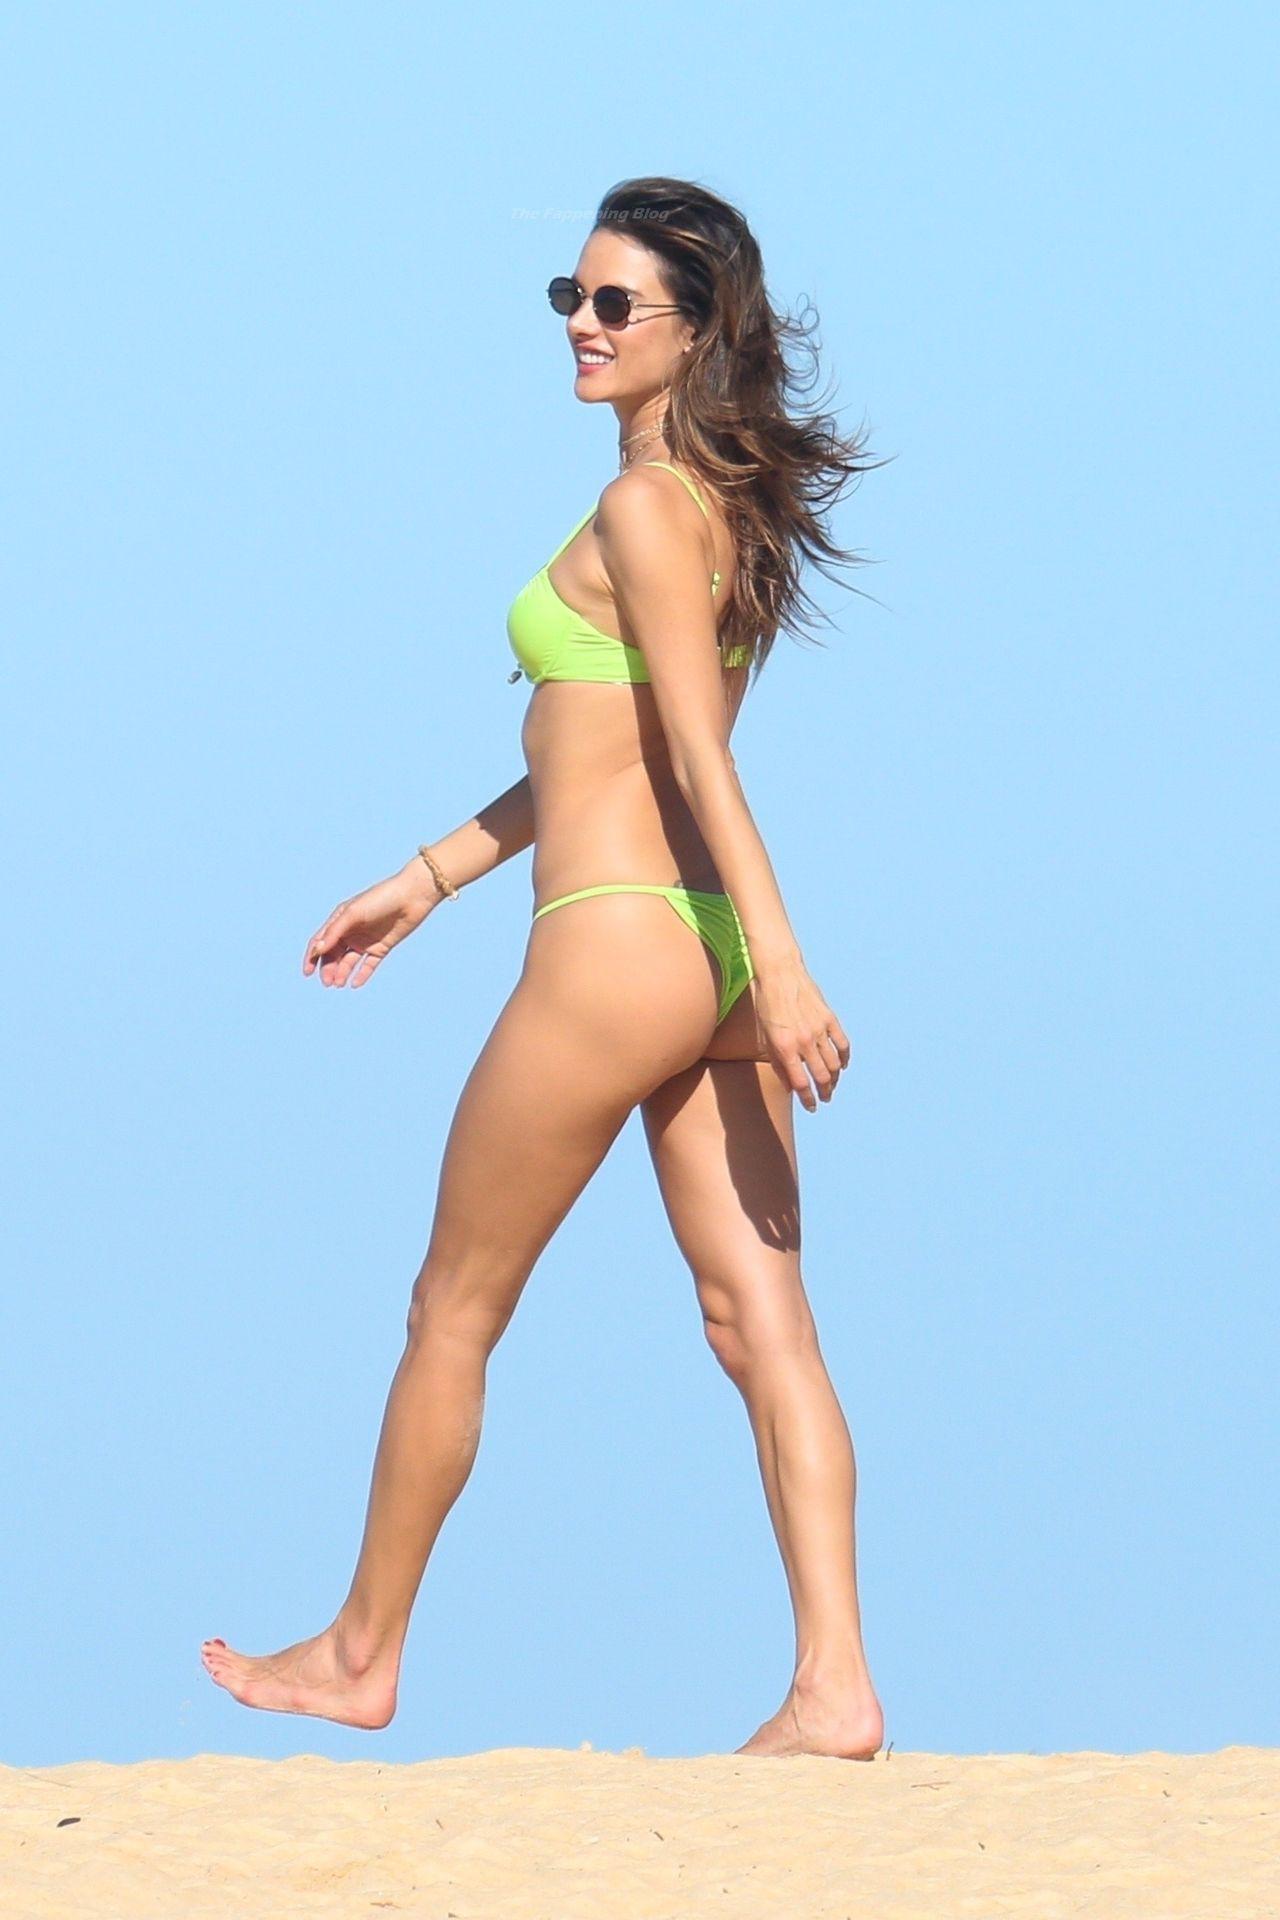 Alessandra-Ambrosio-Sexy-The-Fappening-Blog-881.jpg